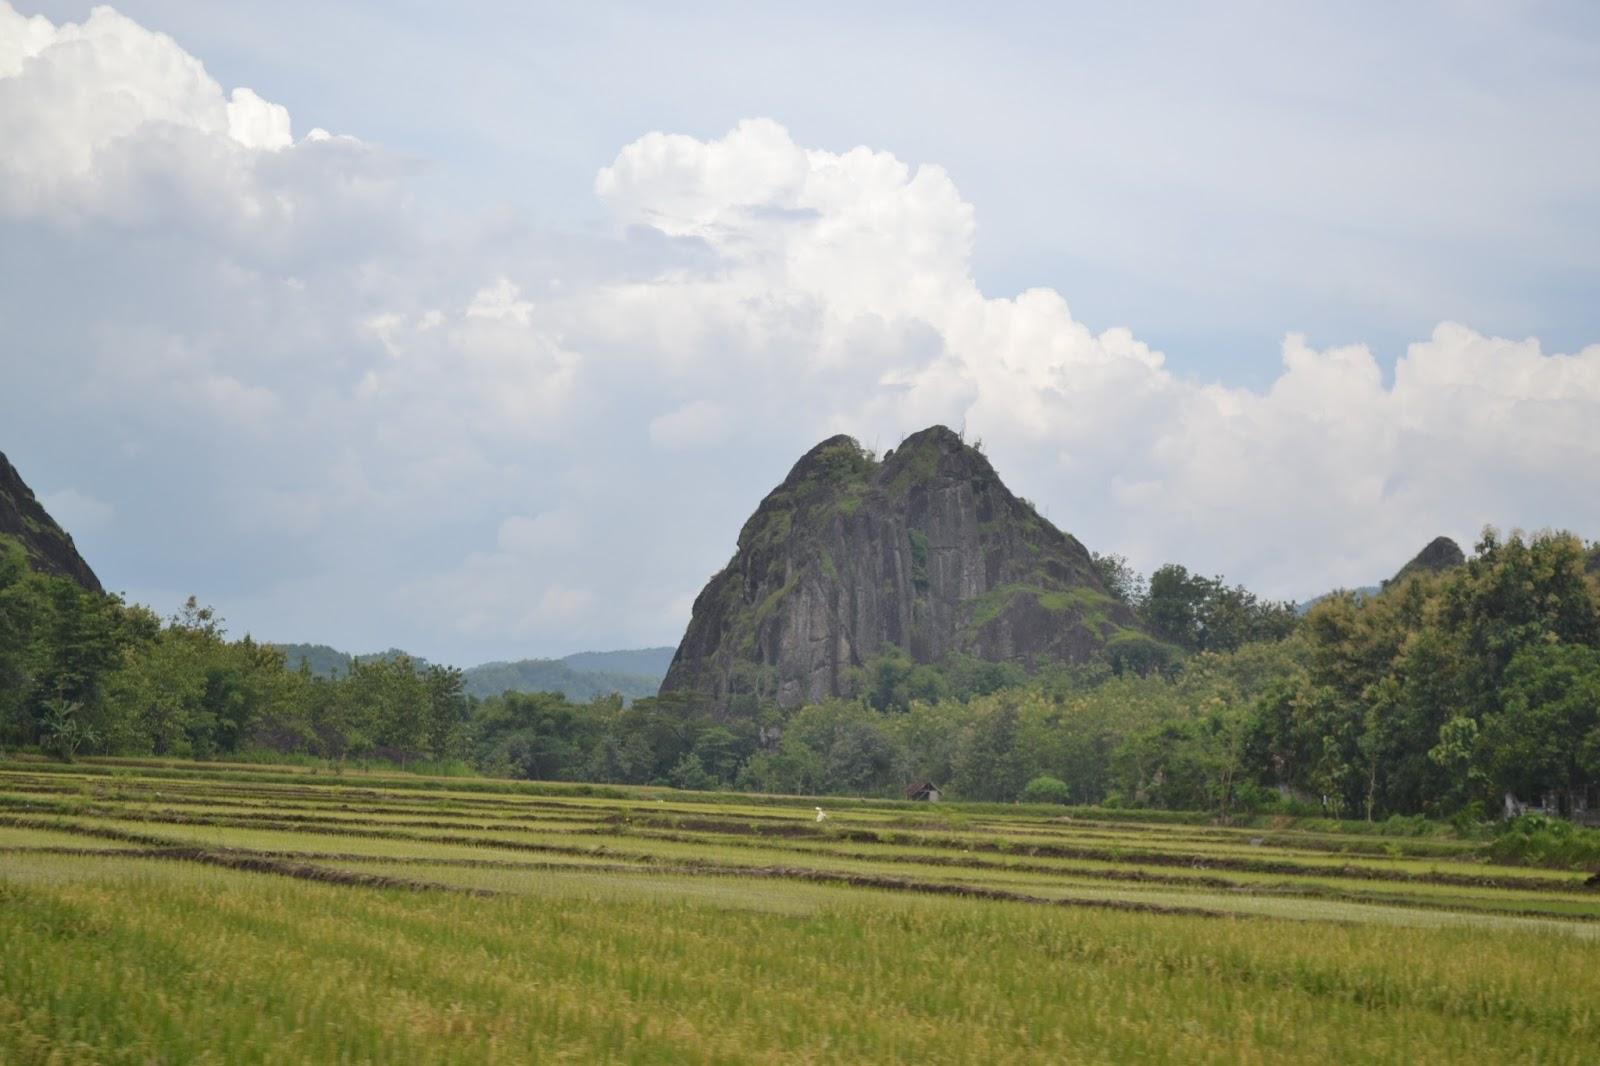 Obyek Wisata Batu Seribu Sukoharjo Makmur Asal Usil Gunung Sepikul